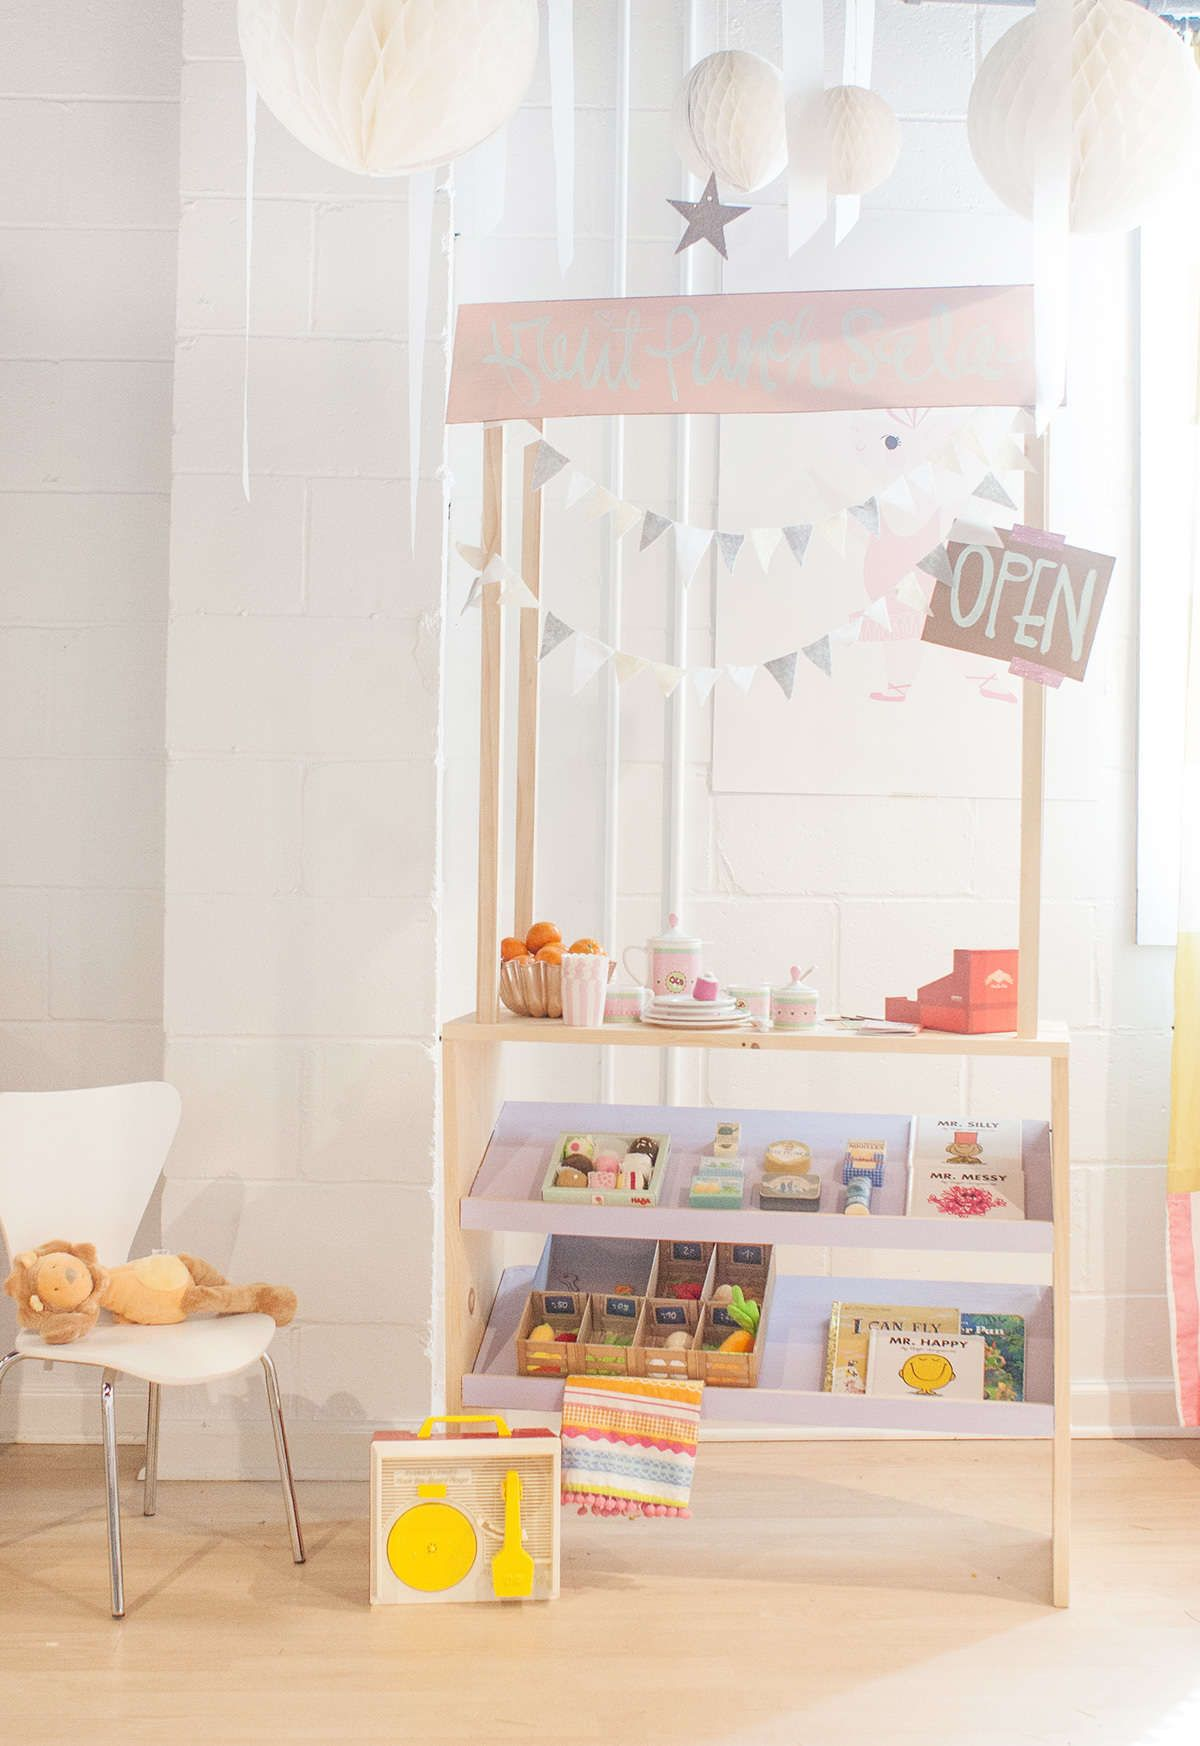 diy grocery stand kaufladen kinderzimmer und kinder. Black Bedroom Furniture Sets. Home Design Ideas